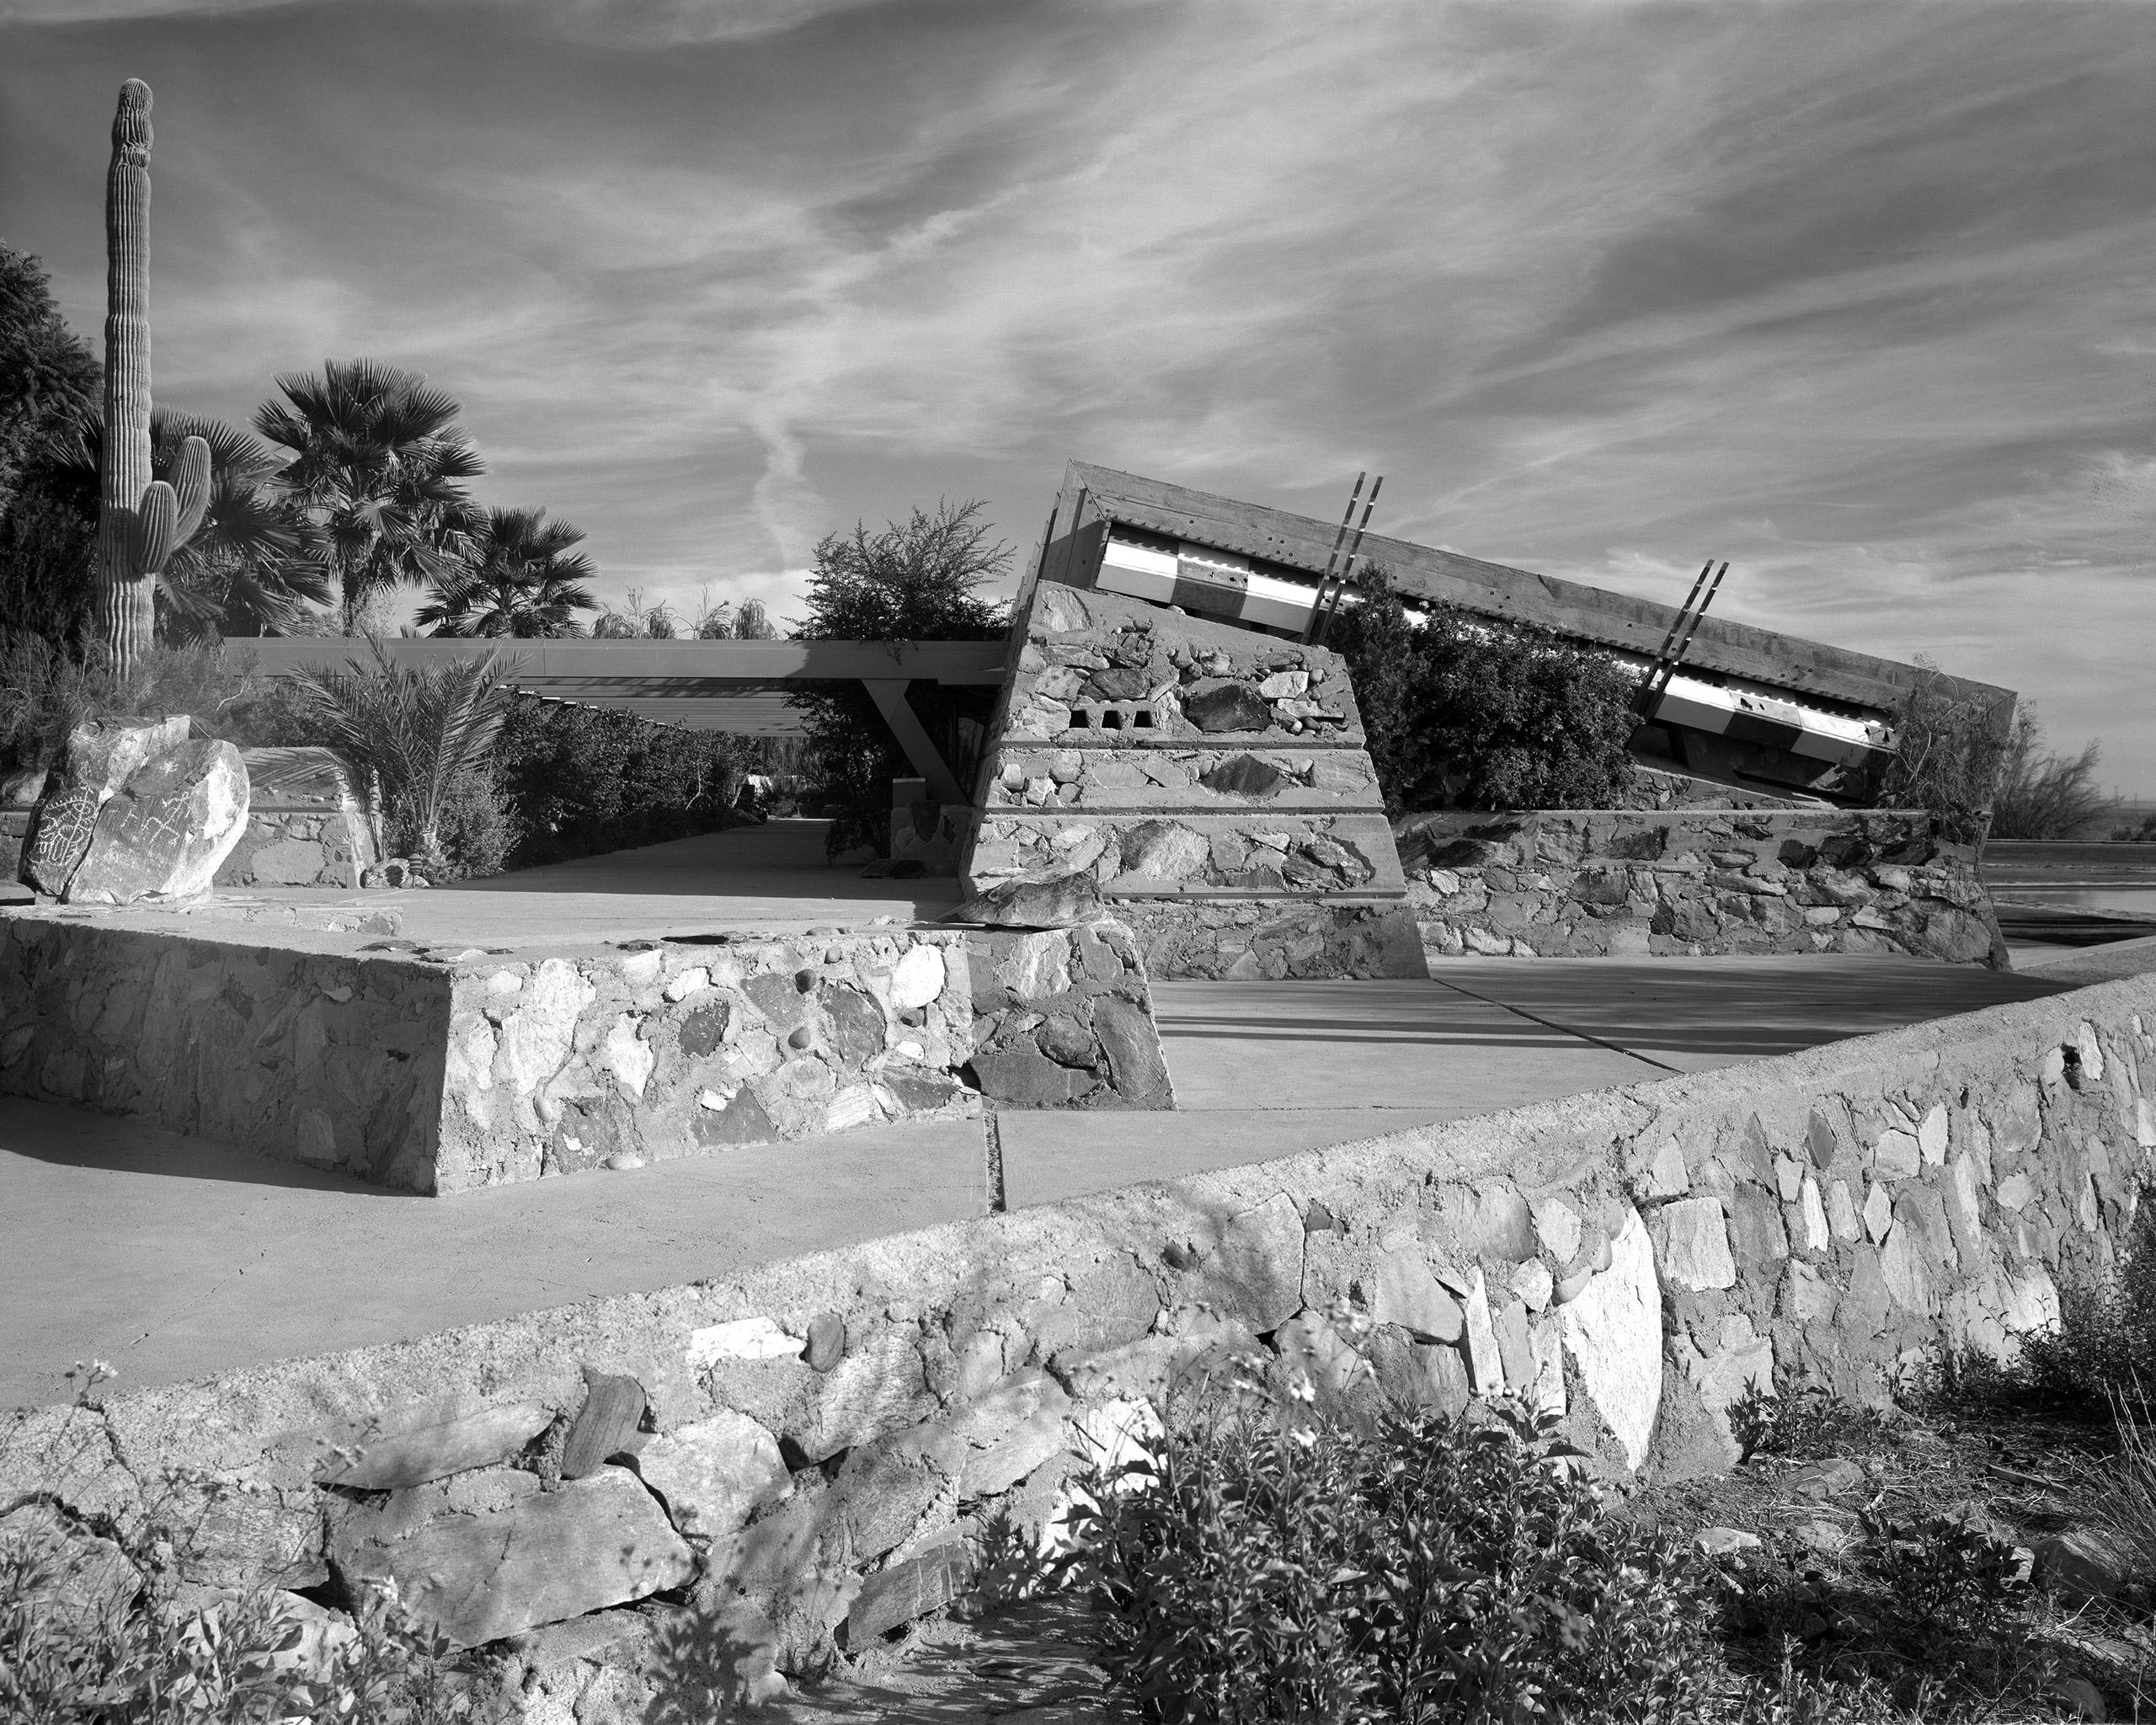 Frank Lloyd Wright's Taliesin West in Scottsdale, Ariz. Built circa 1937.